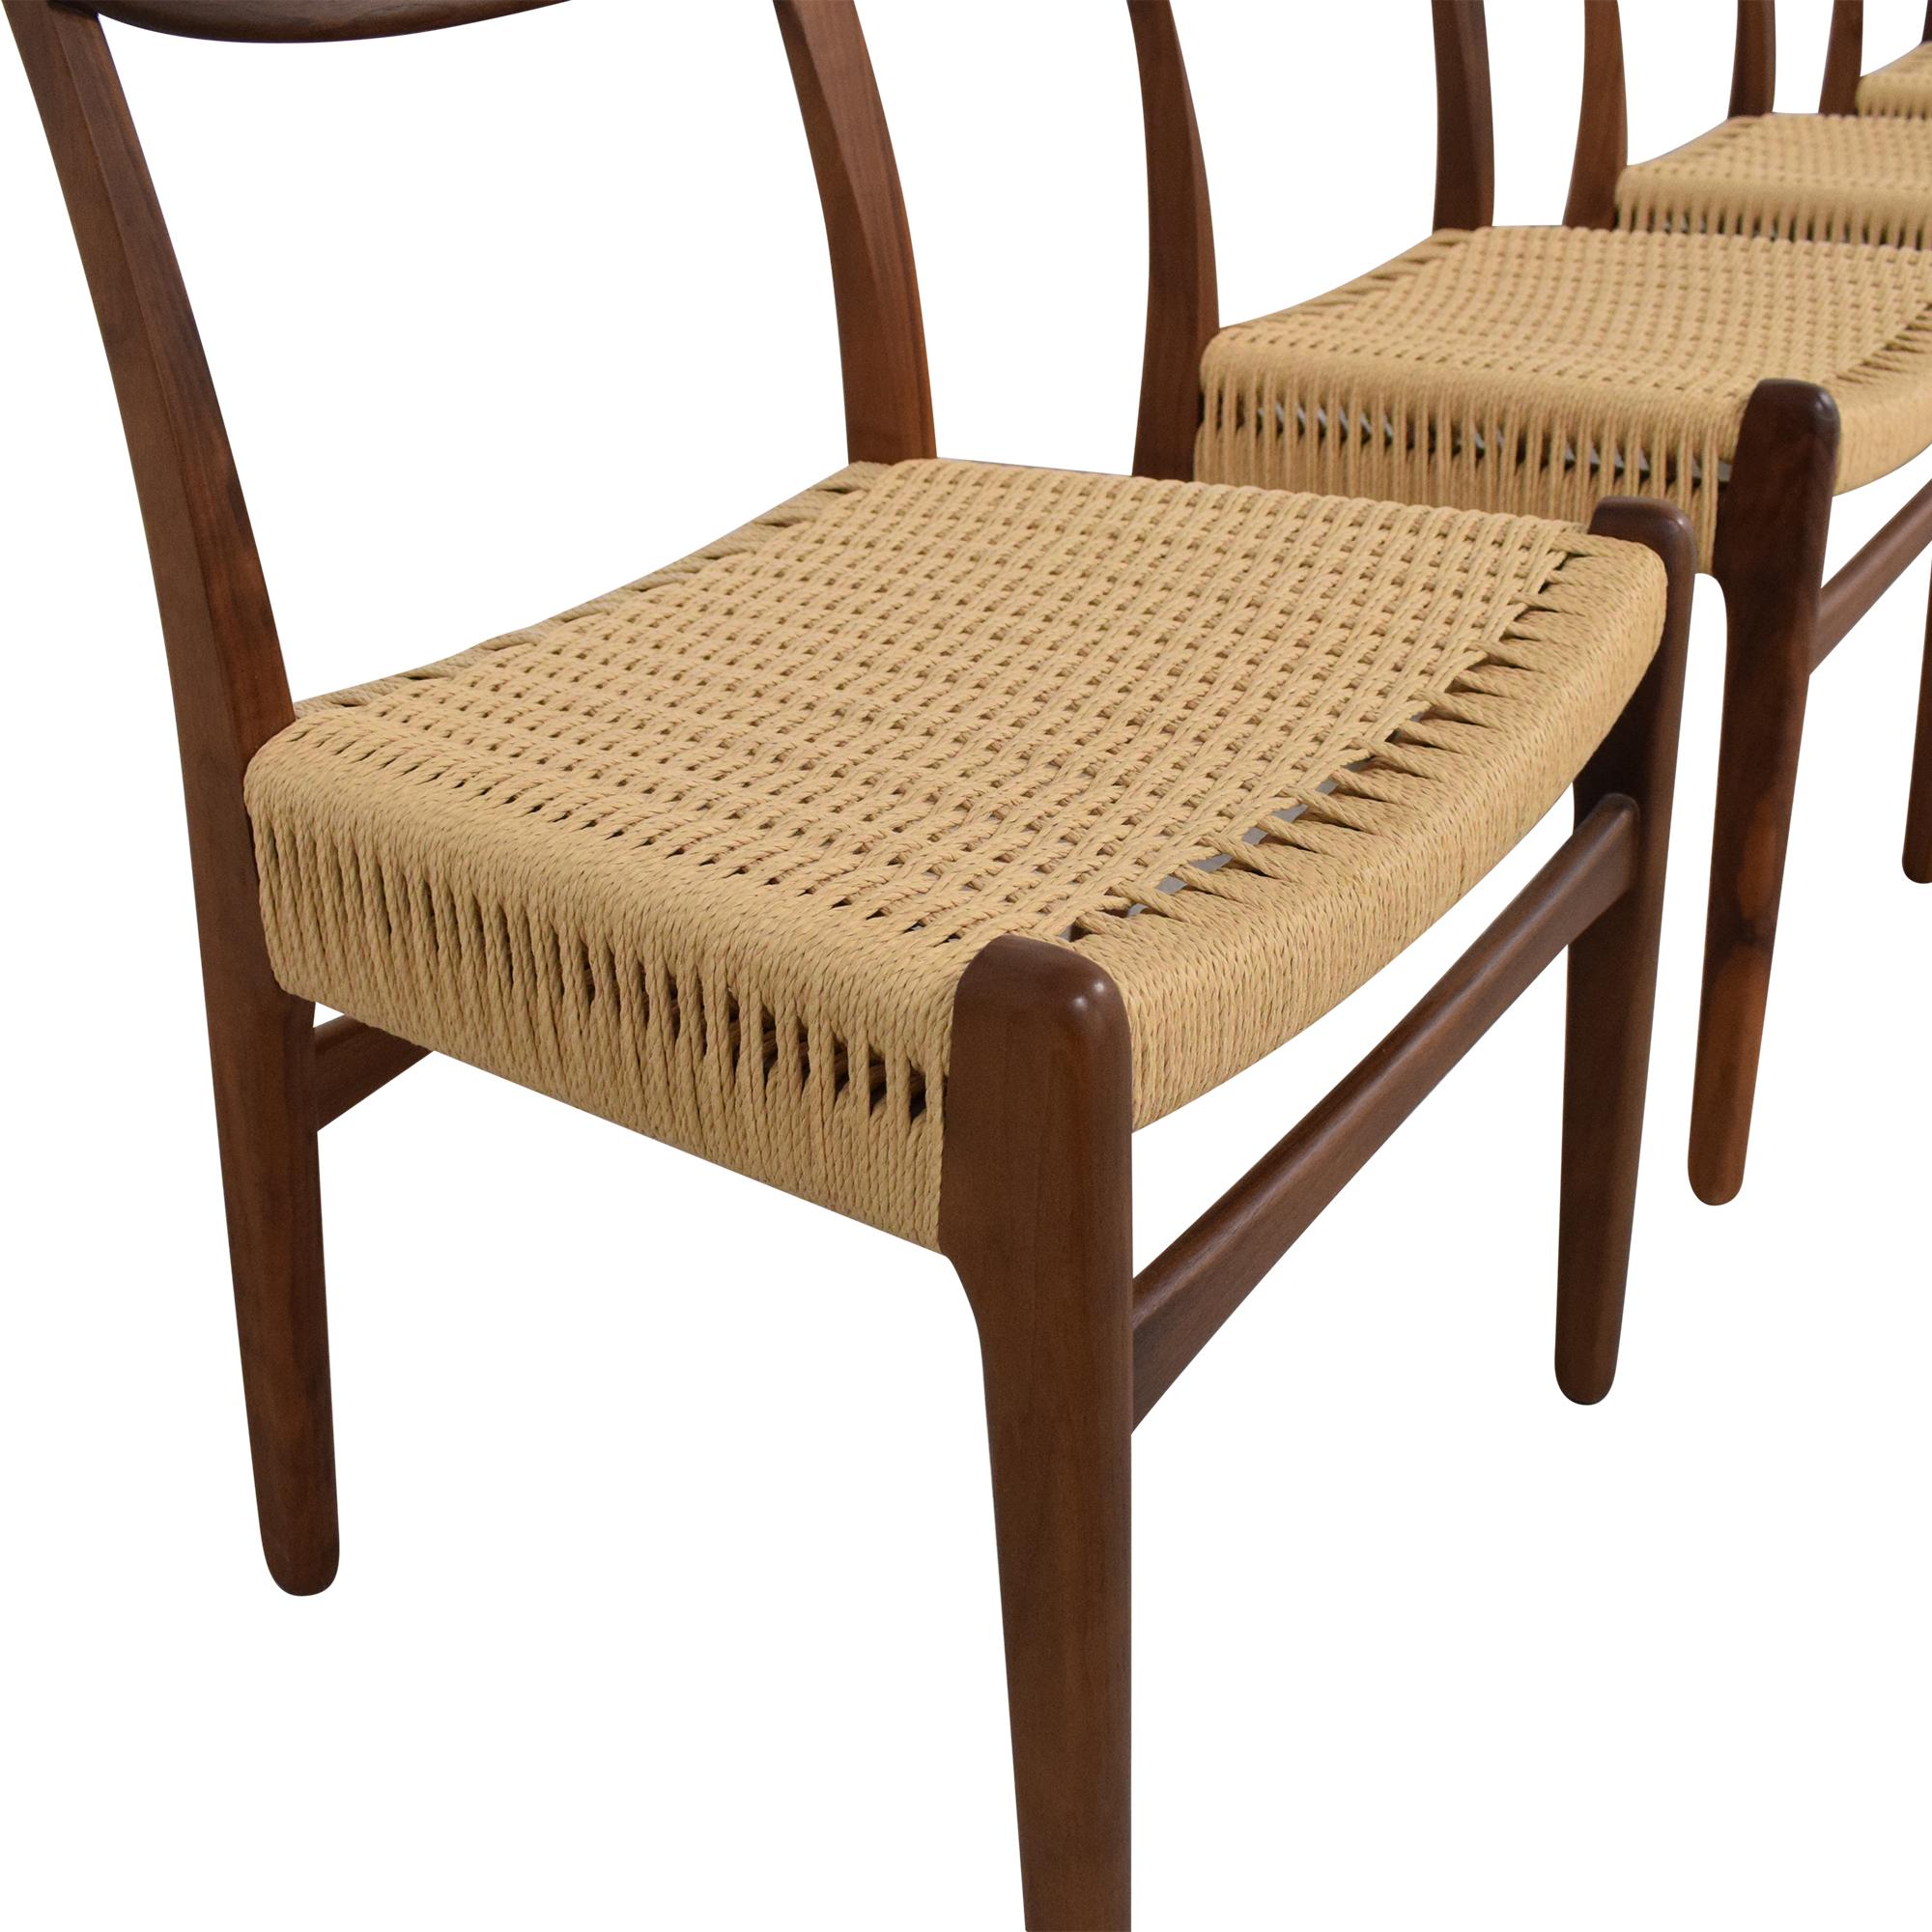 Sit Down New York Hans Wegner-Style Mid Century Dining Chairs price